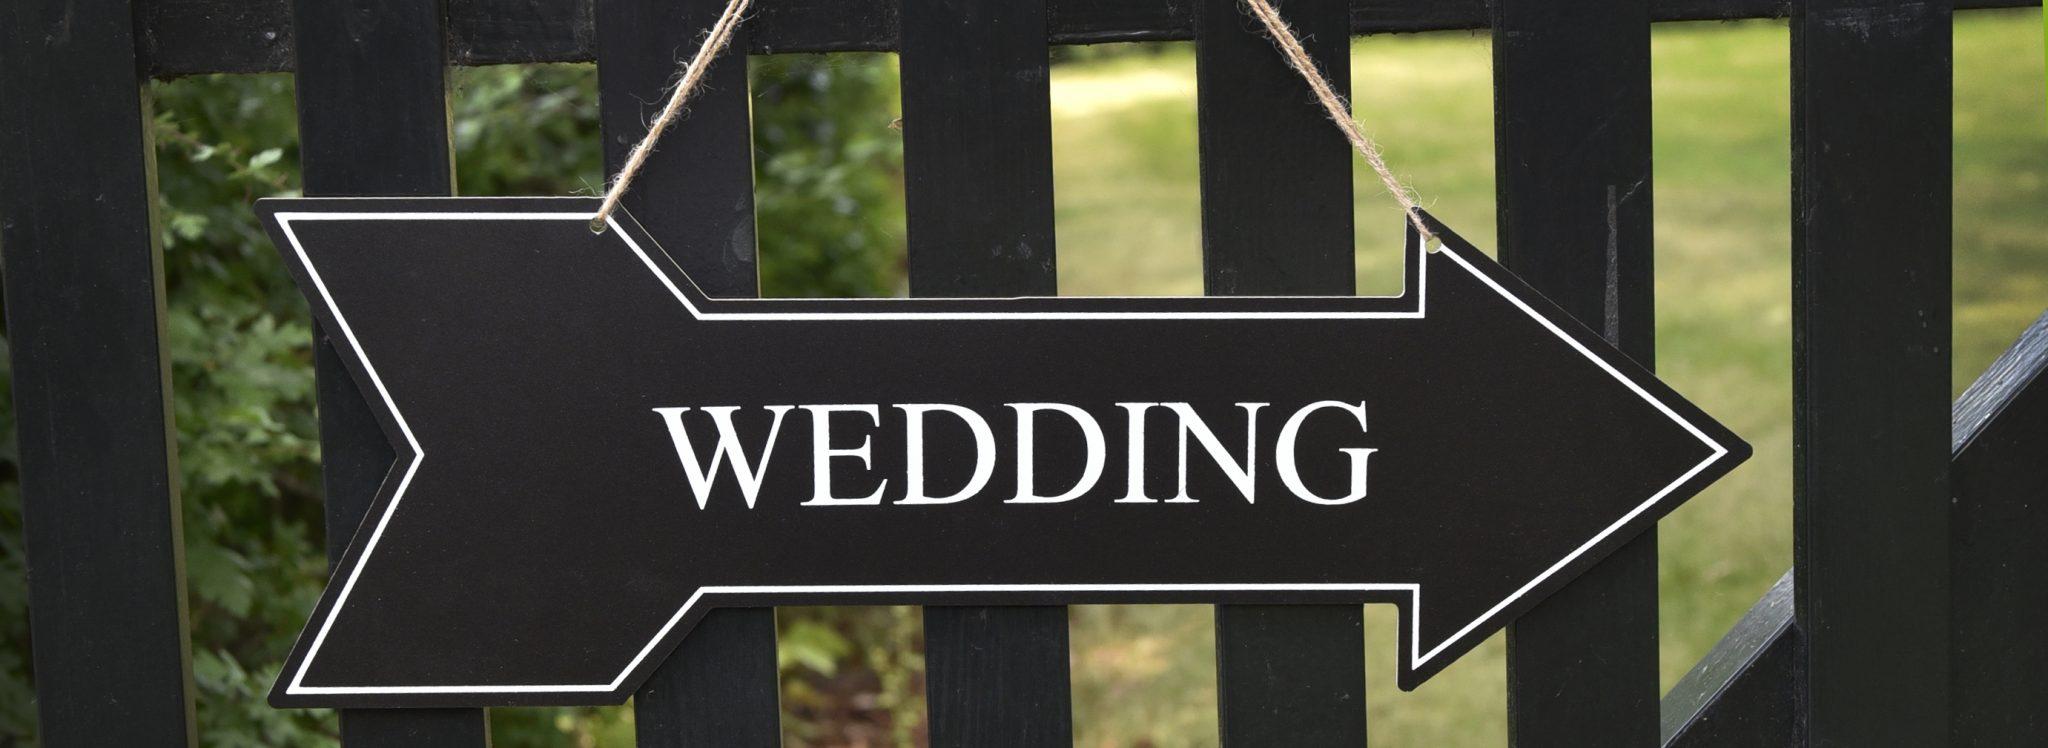 Wedding sign_pijl